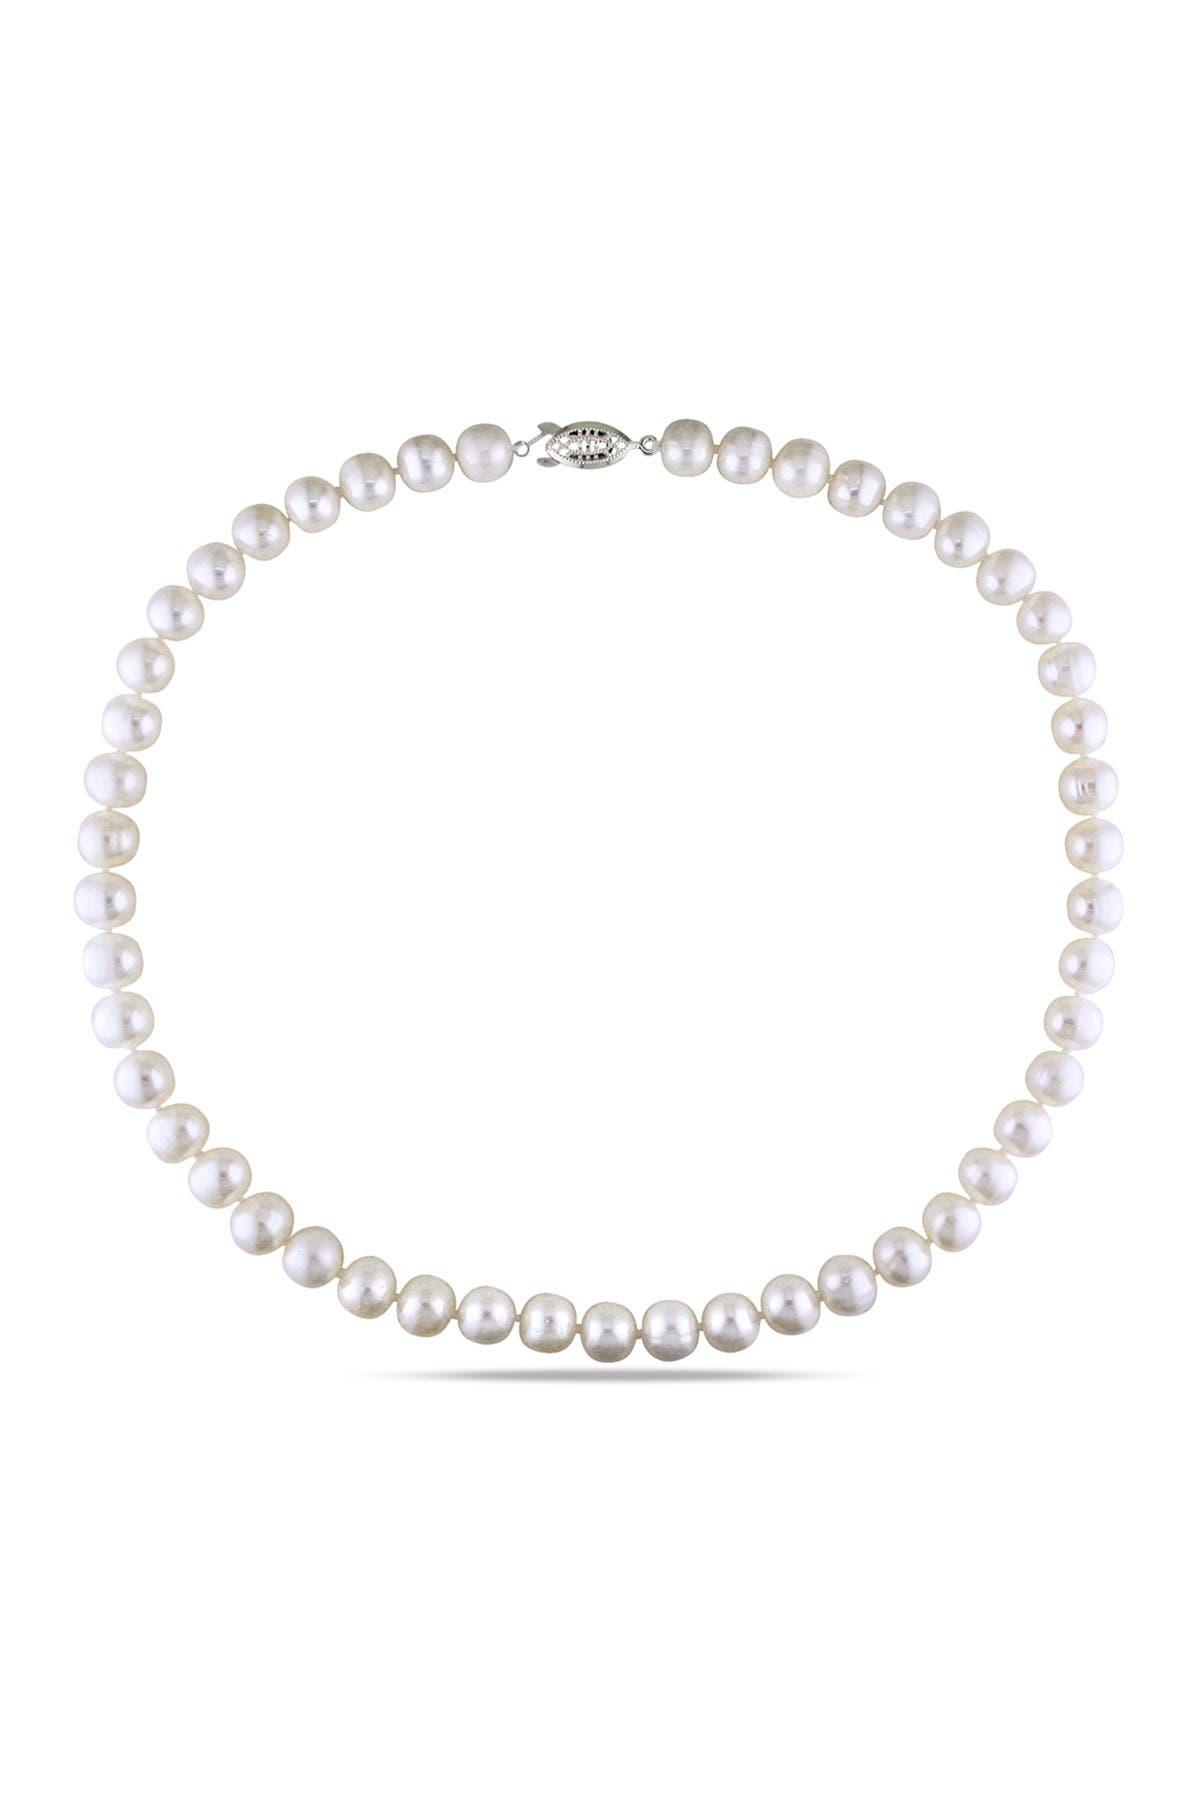 Image of Delmar 9-10mm White Pearl Necklace